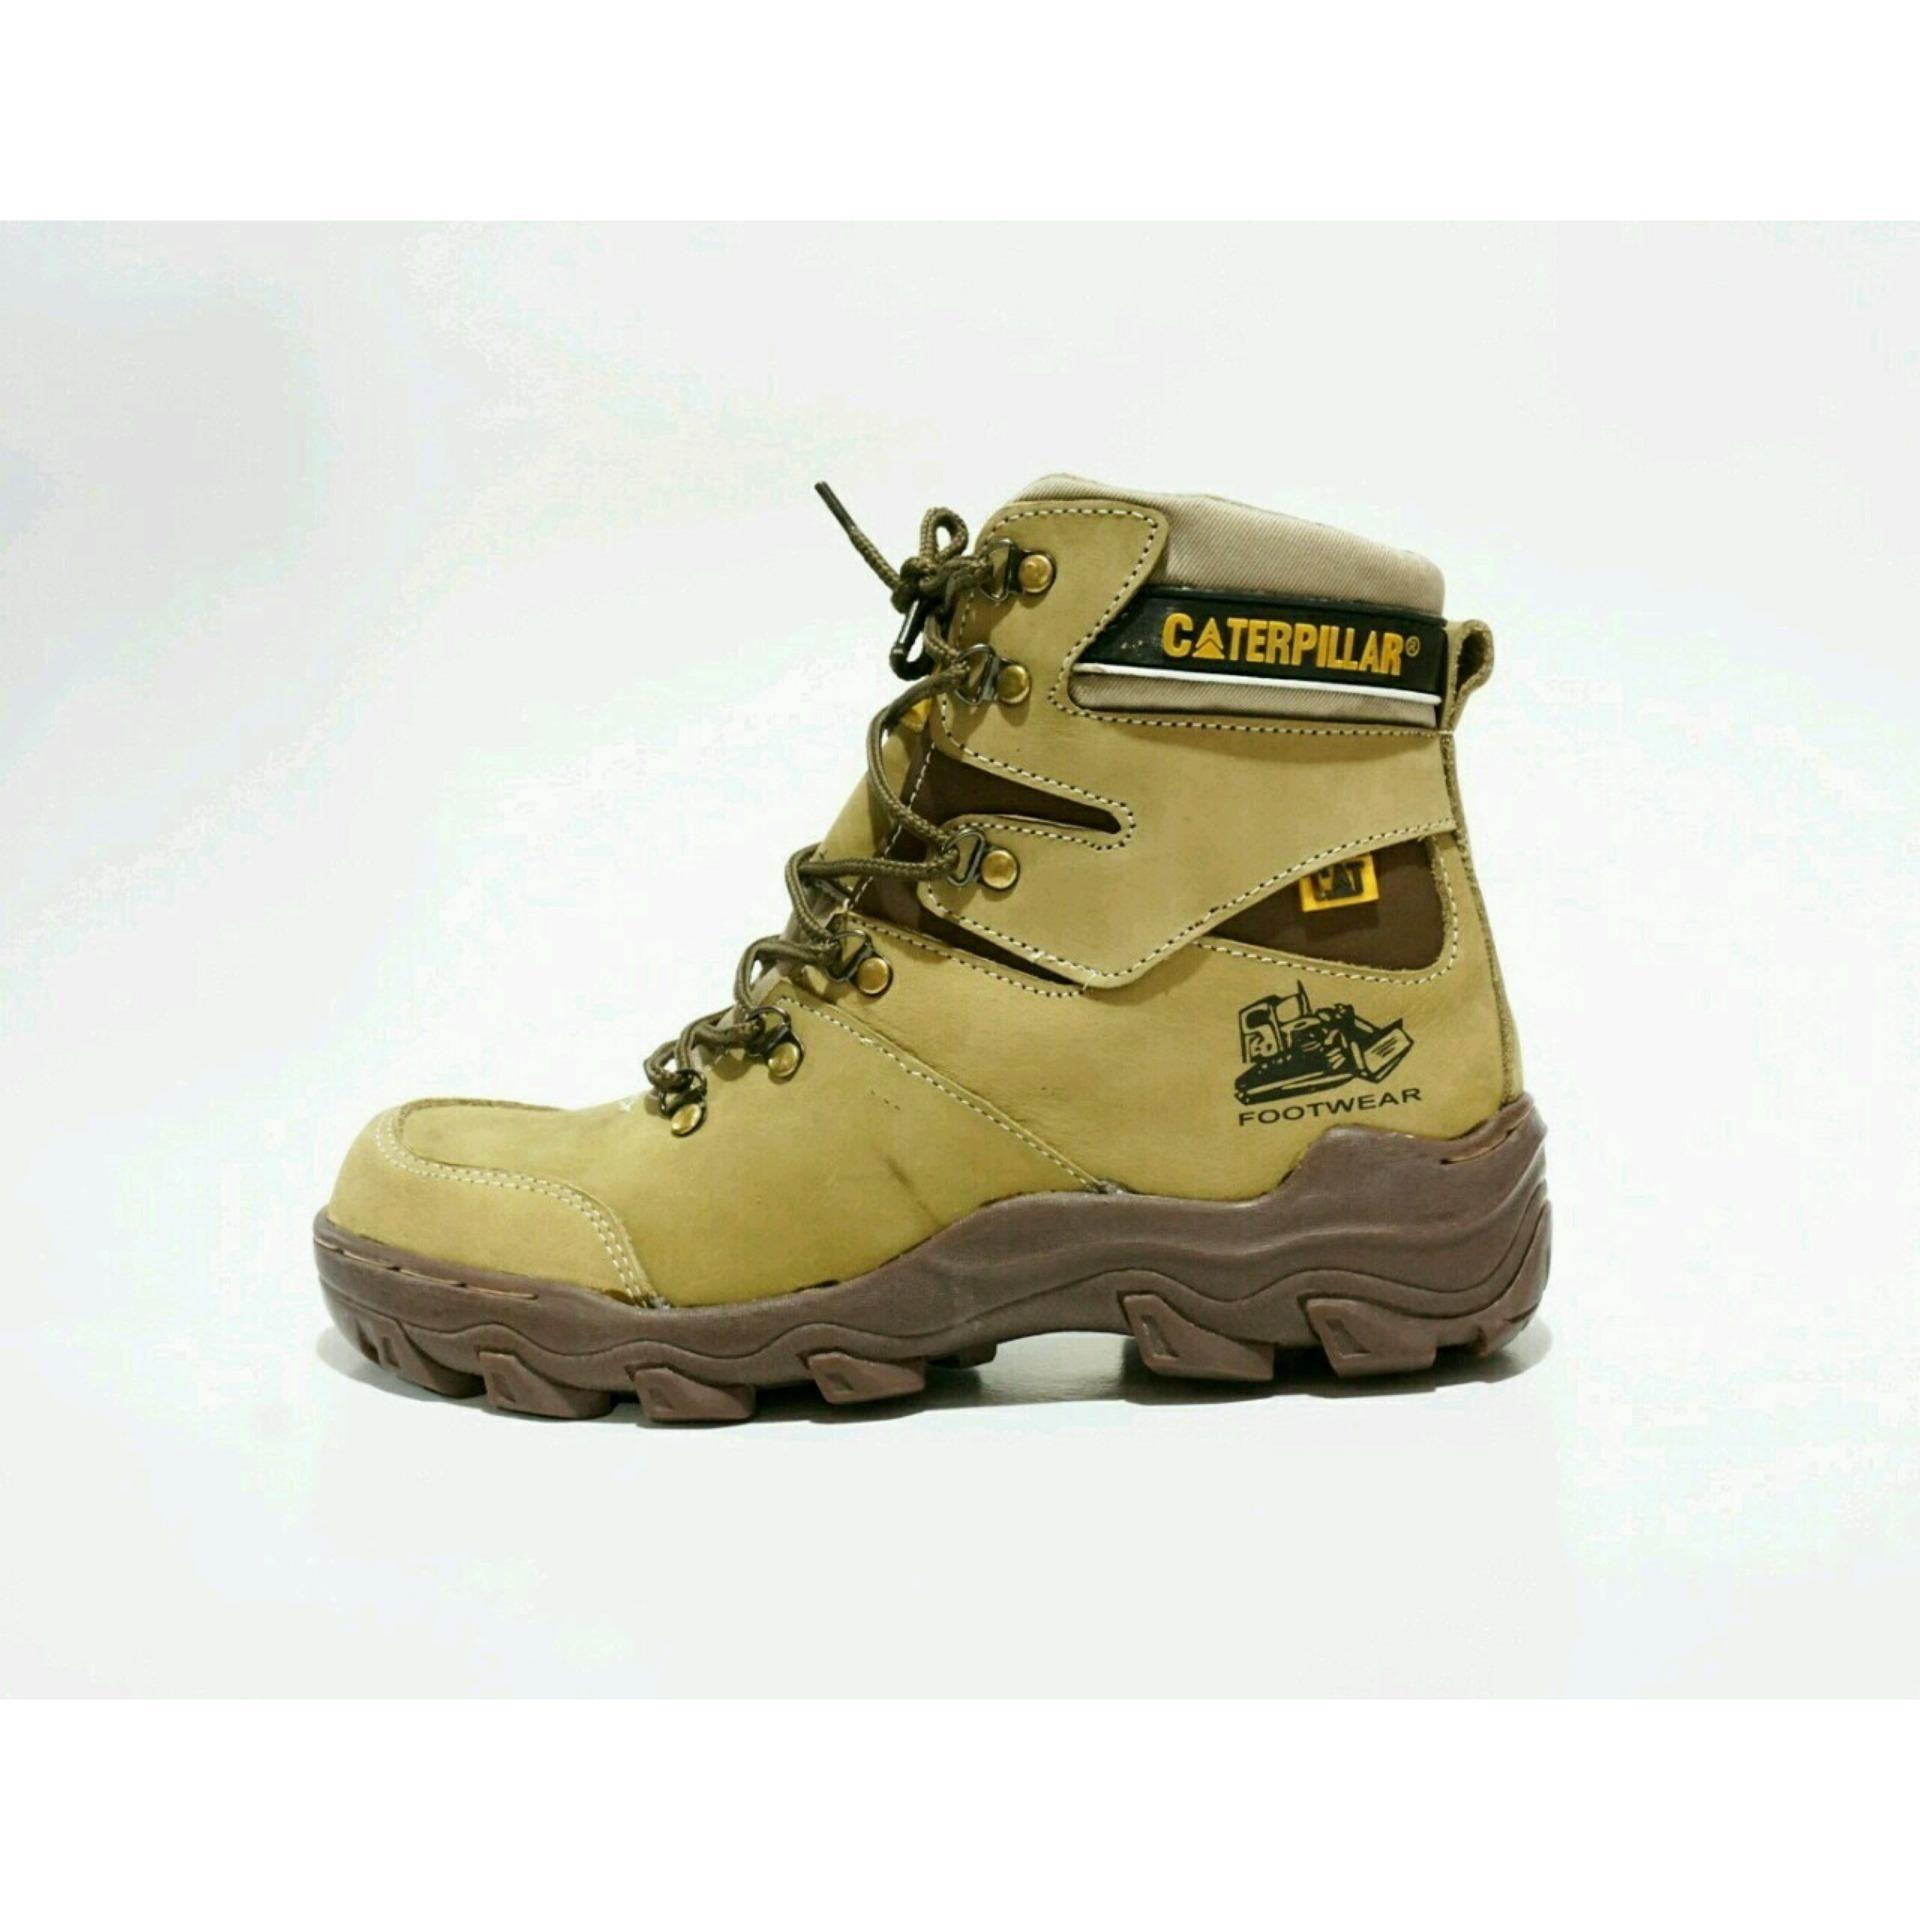 Sepatu Caterpillar Pajero Safety Boots KULIT ASLI (Dengan